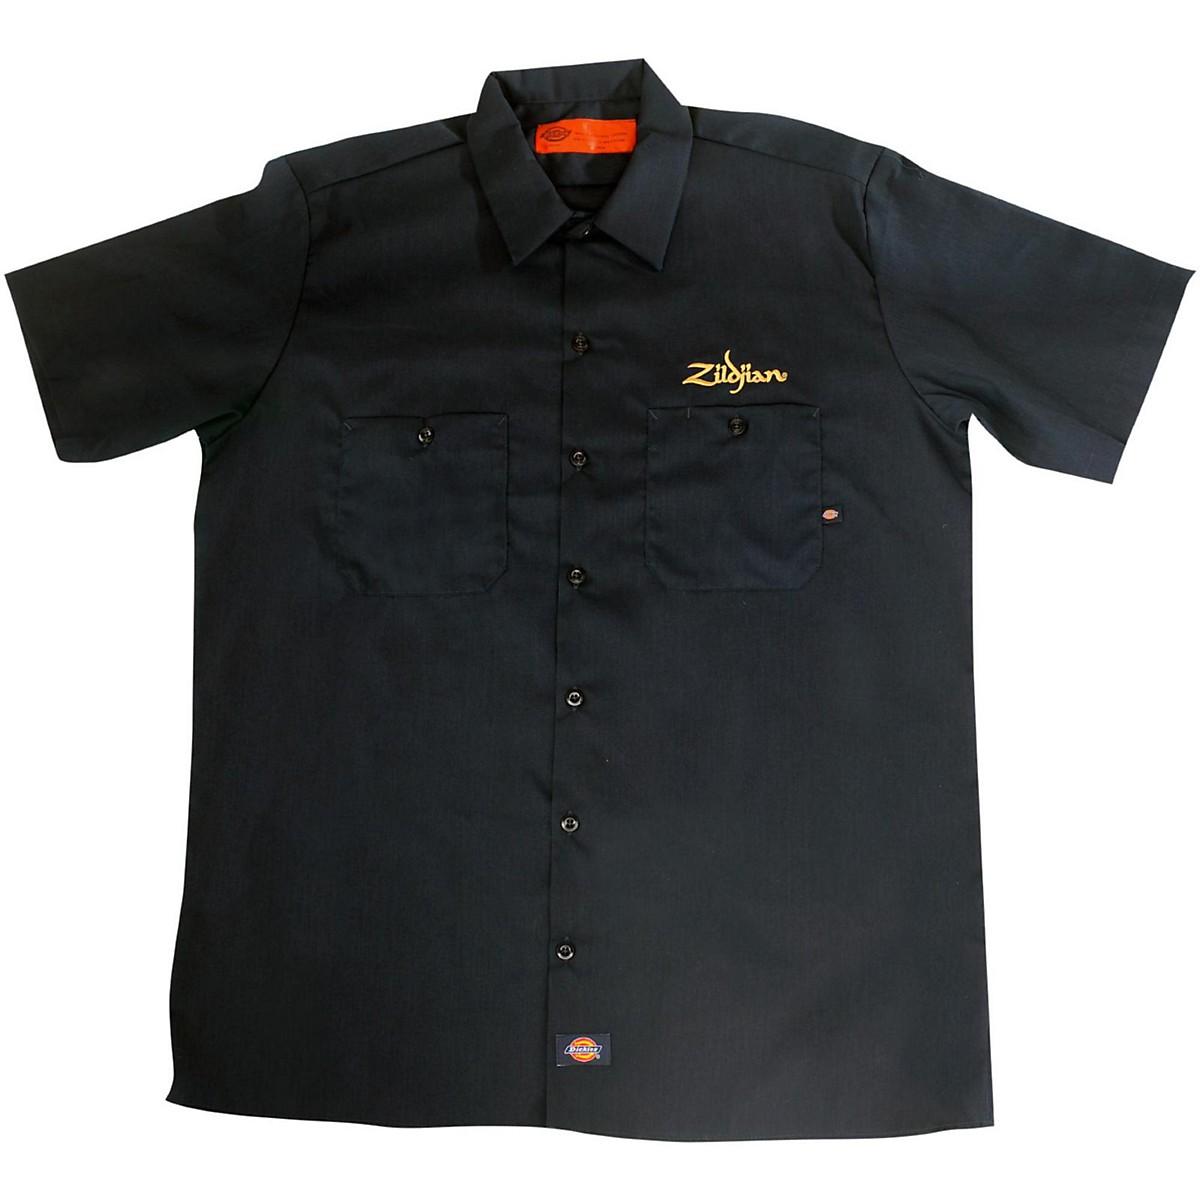 Zildjian Dickies Work Shirt